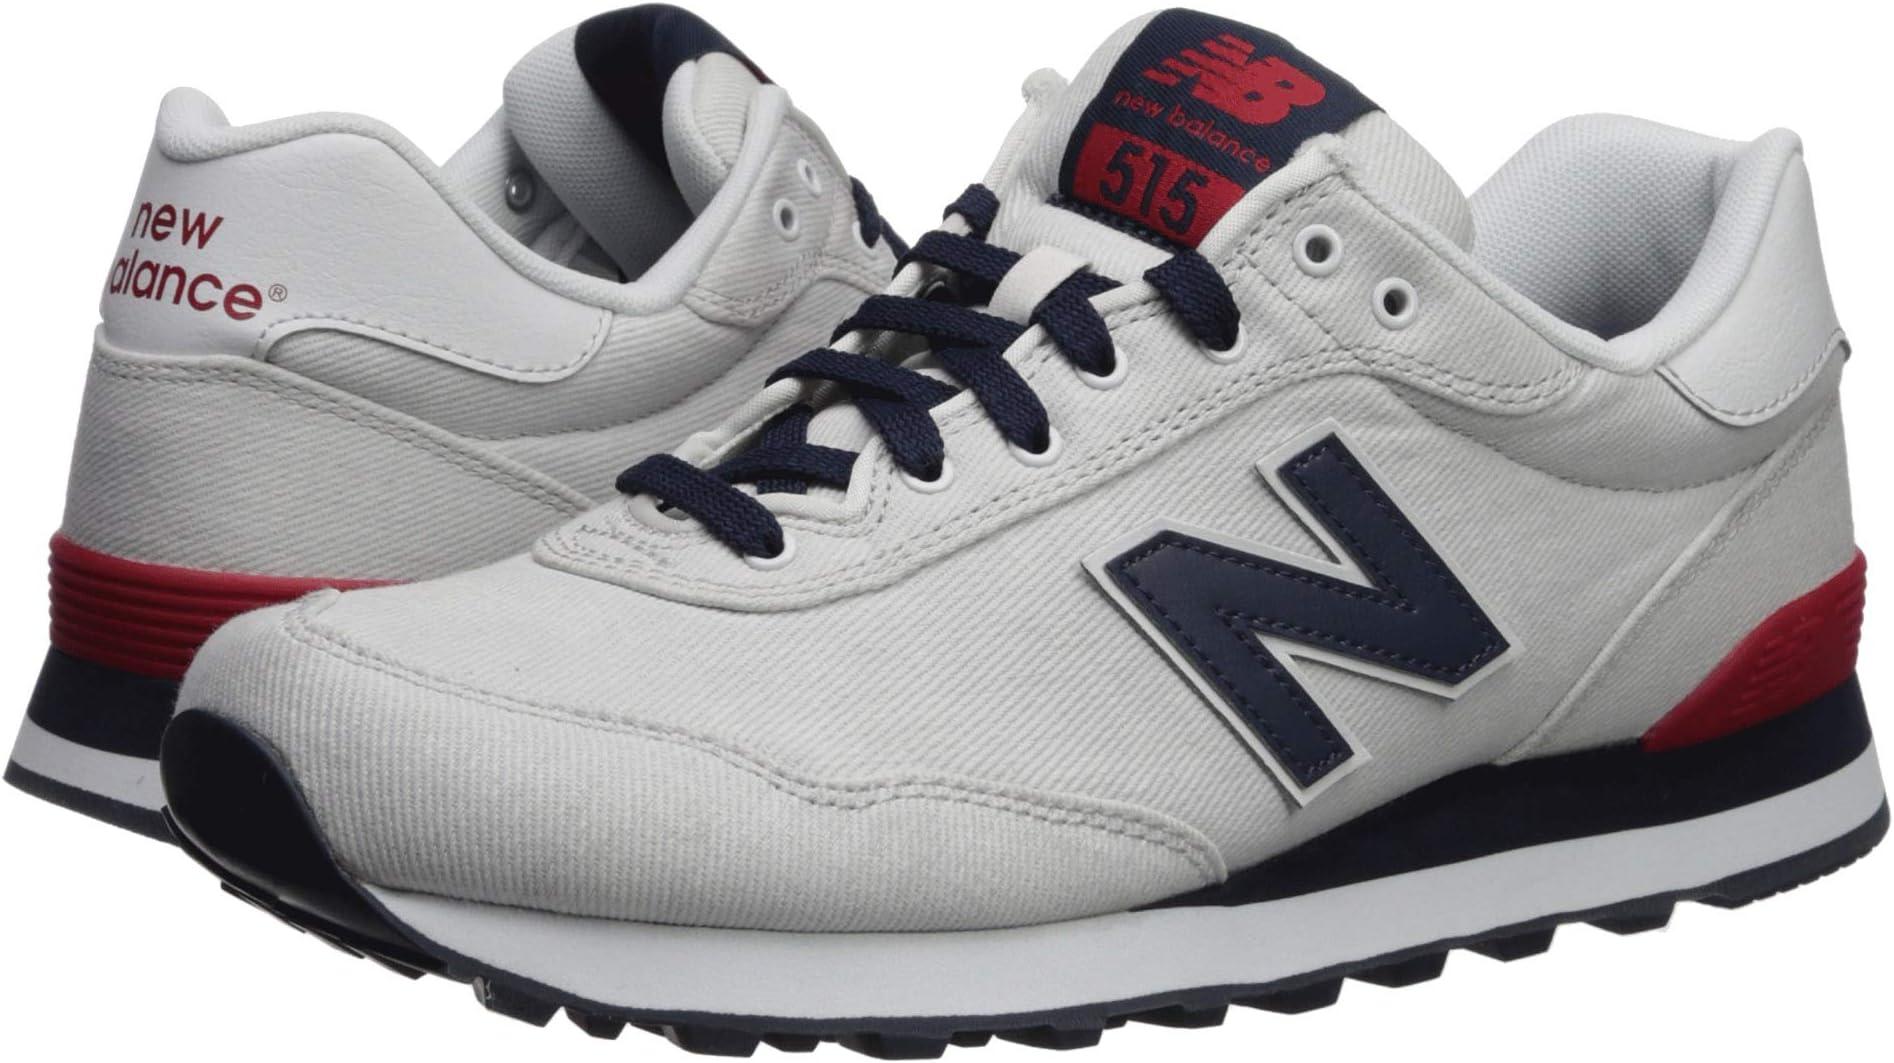 huge discount d7ec5 27b92 New Balance Shoes, Clothing, Activewear, Socks   Zappos.com